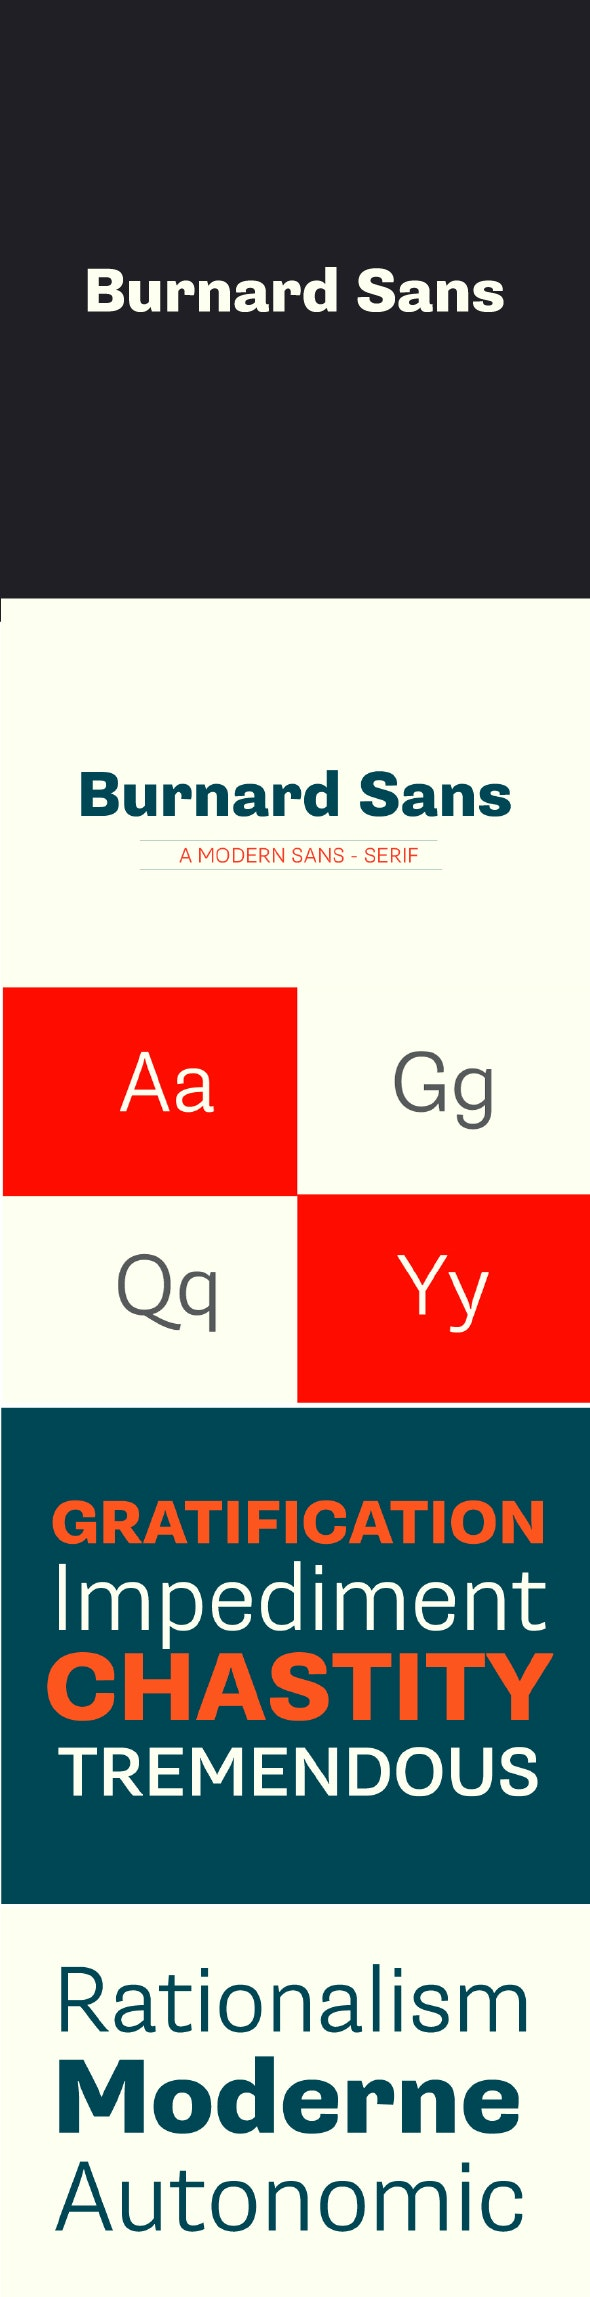 Burnard Sans Font - Miscellaneous Sans-Serif